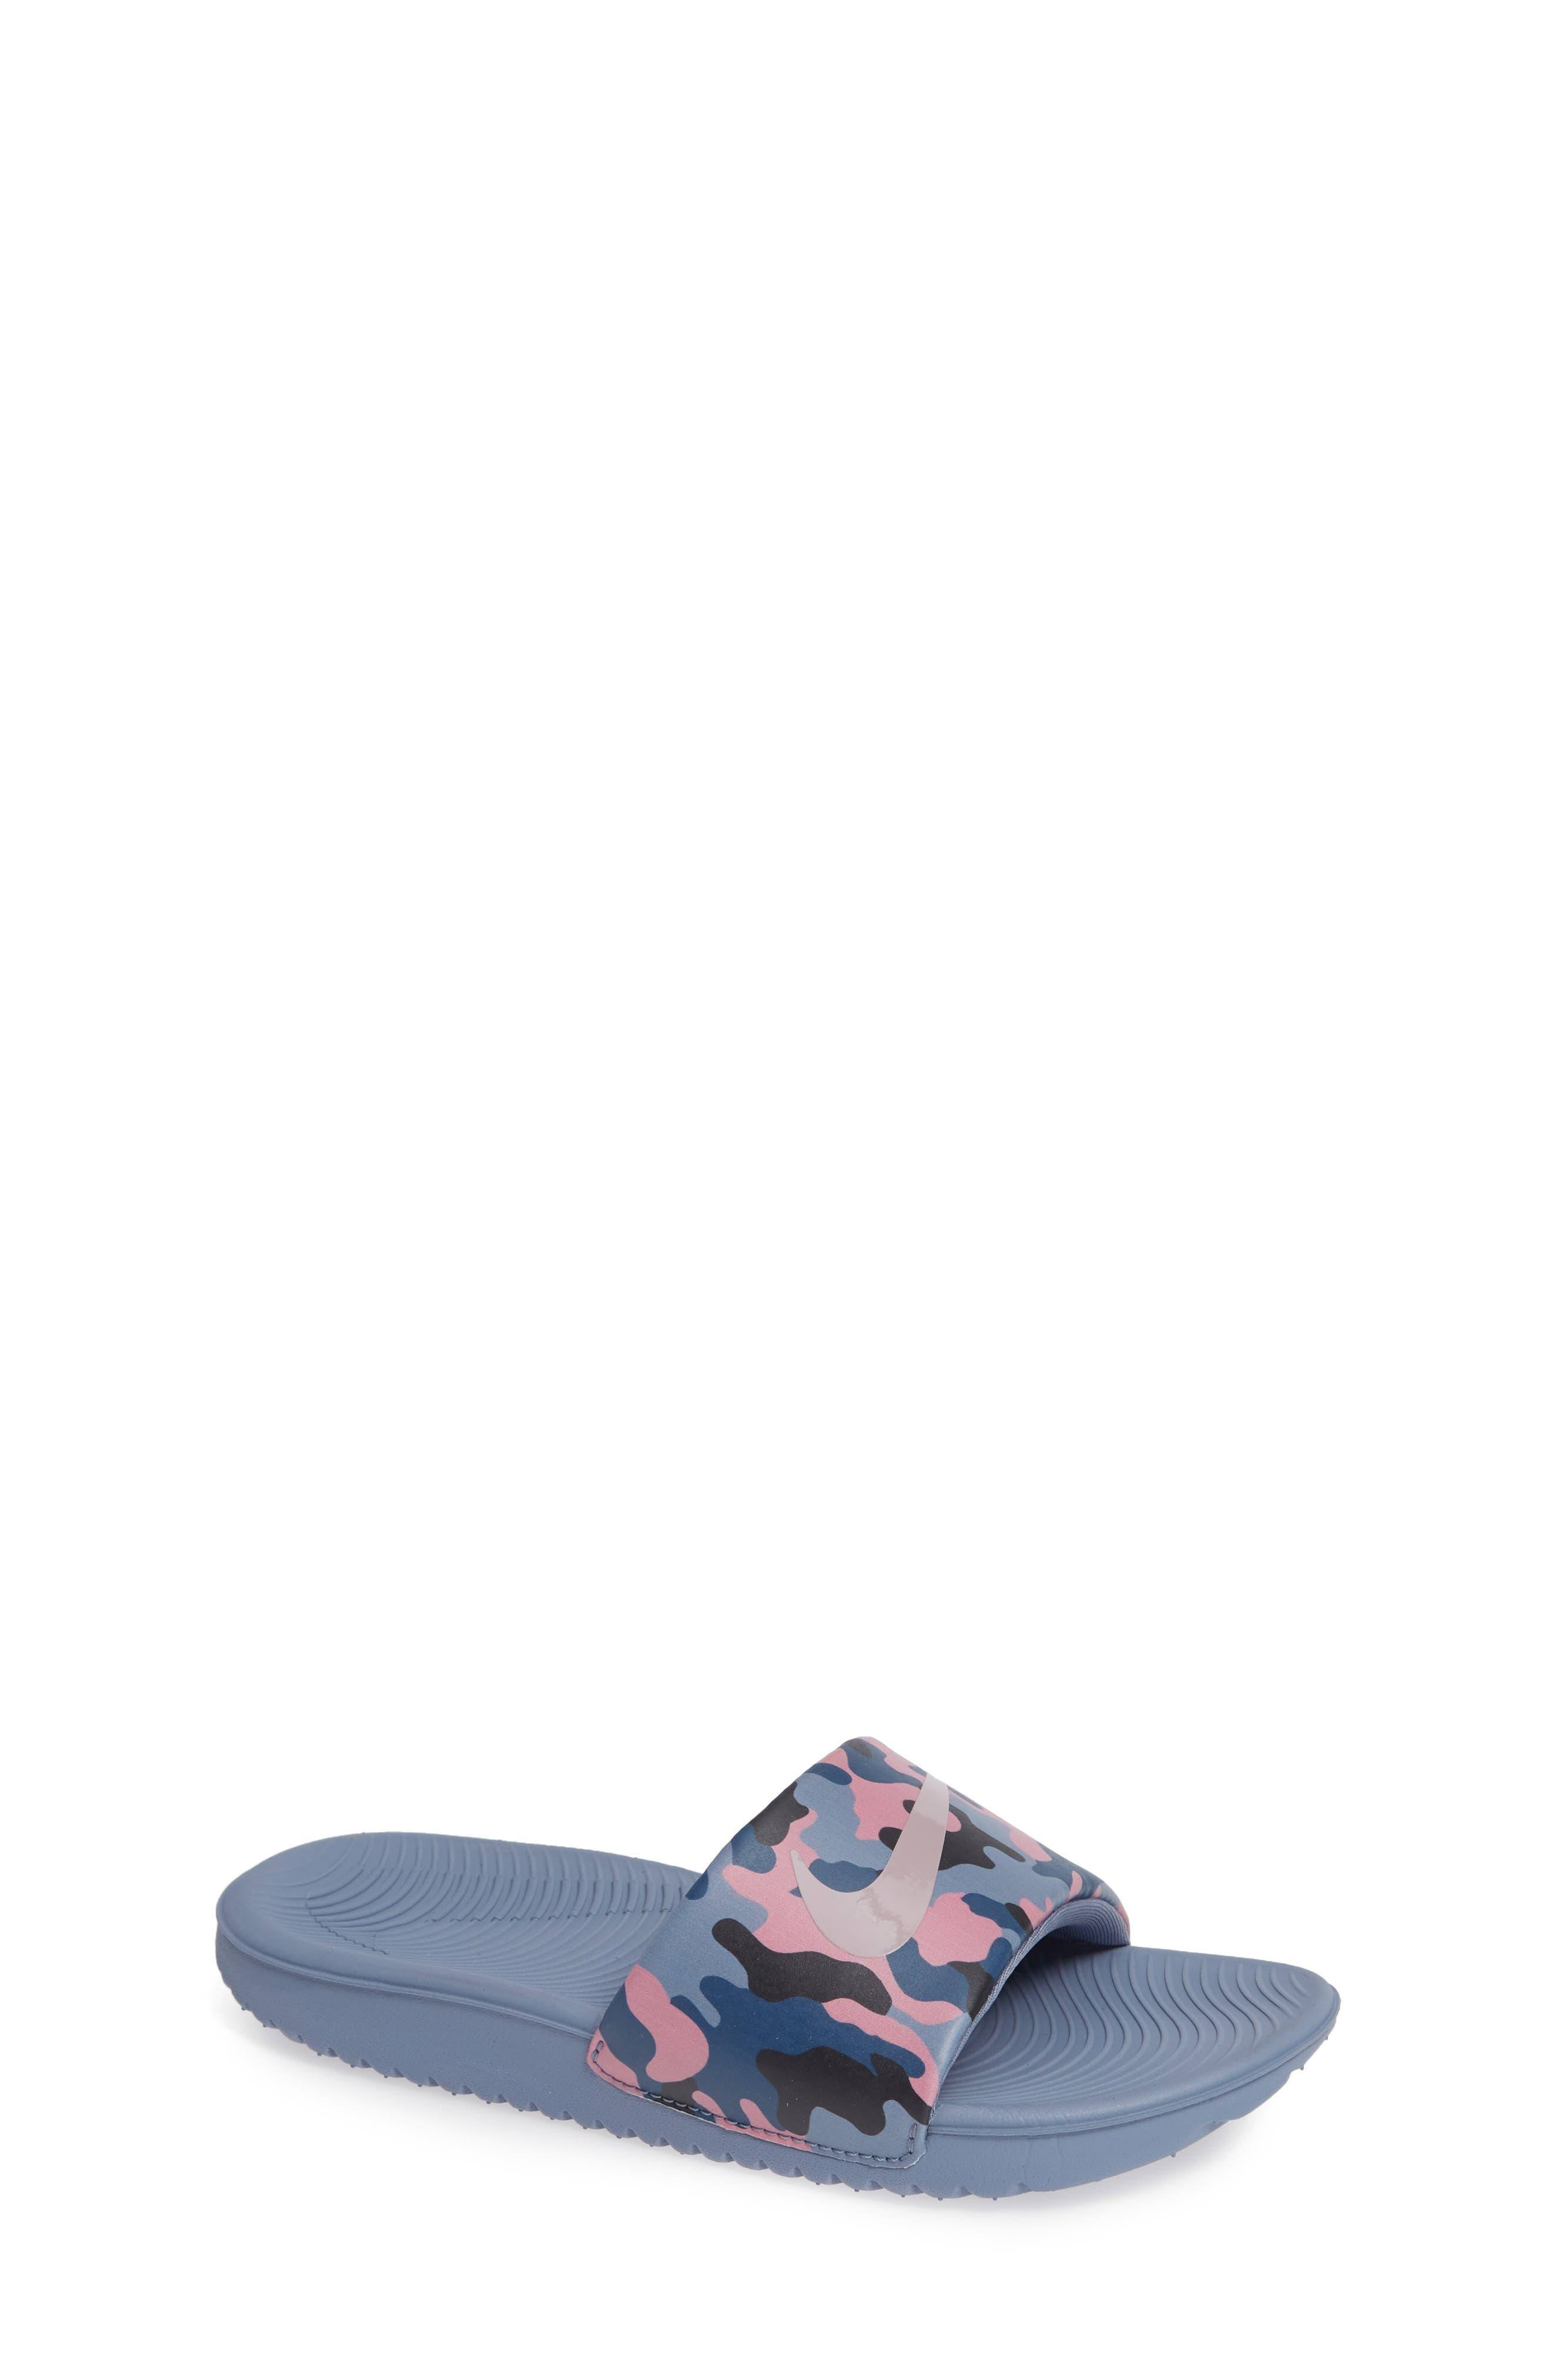 Kawa Slide Sandal,                             Main thumbnail 1, color,                             SLATE/ ROSE/ DIFFUSED BLUE